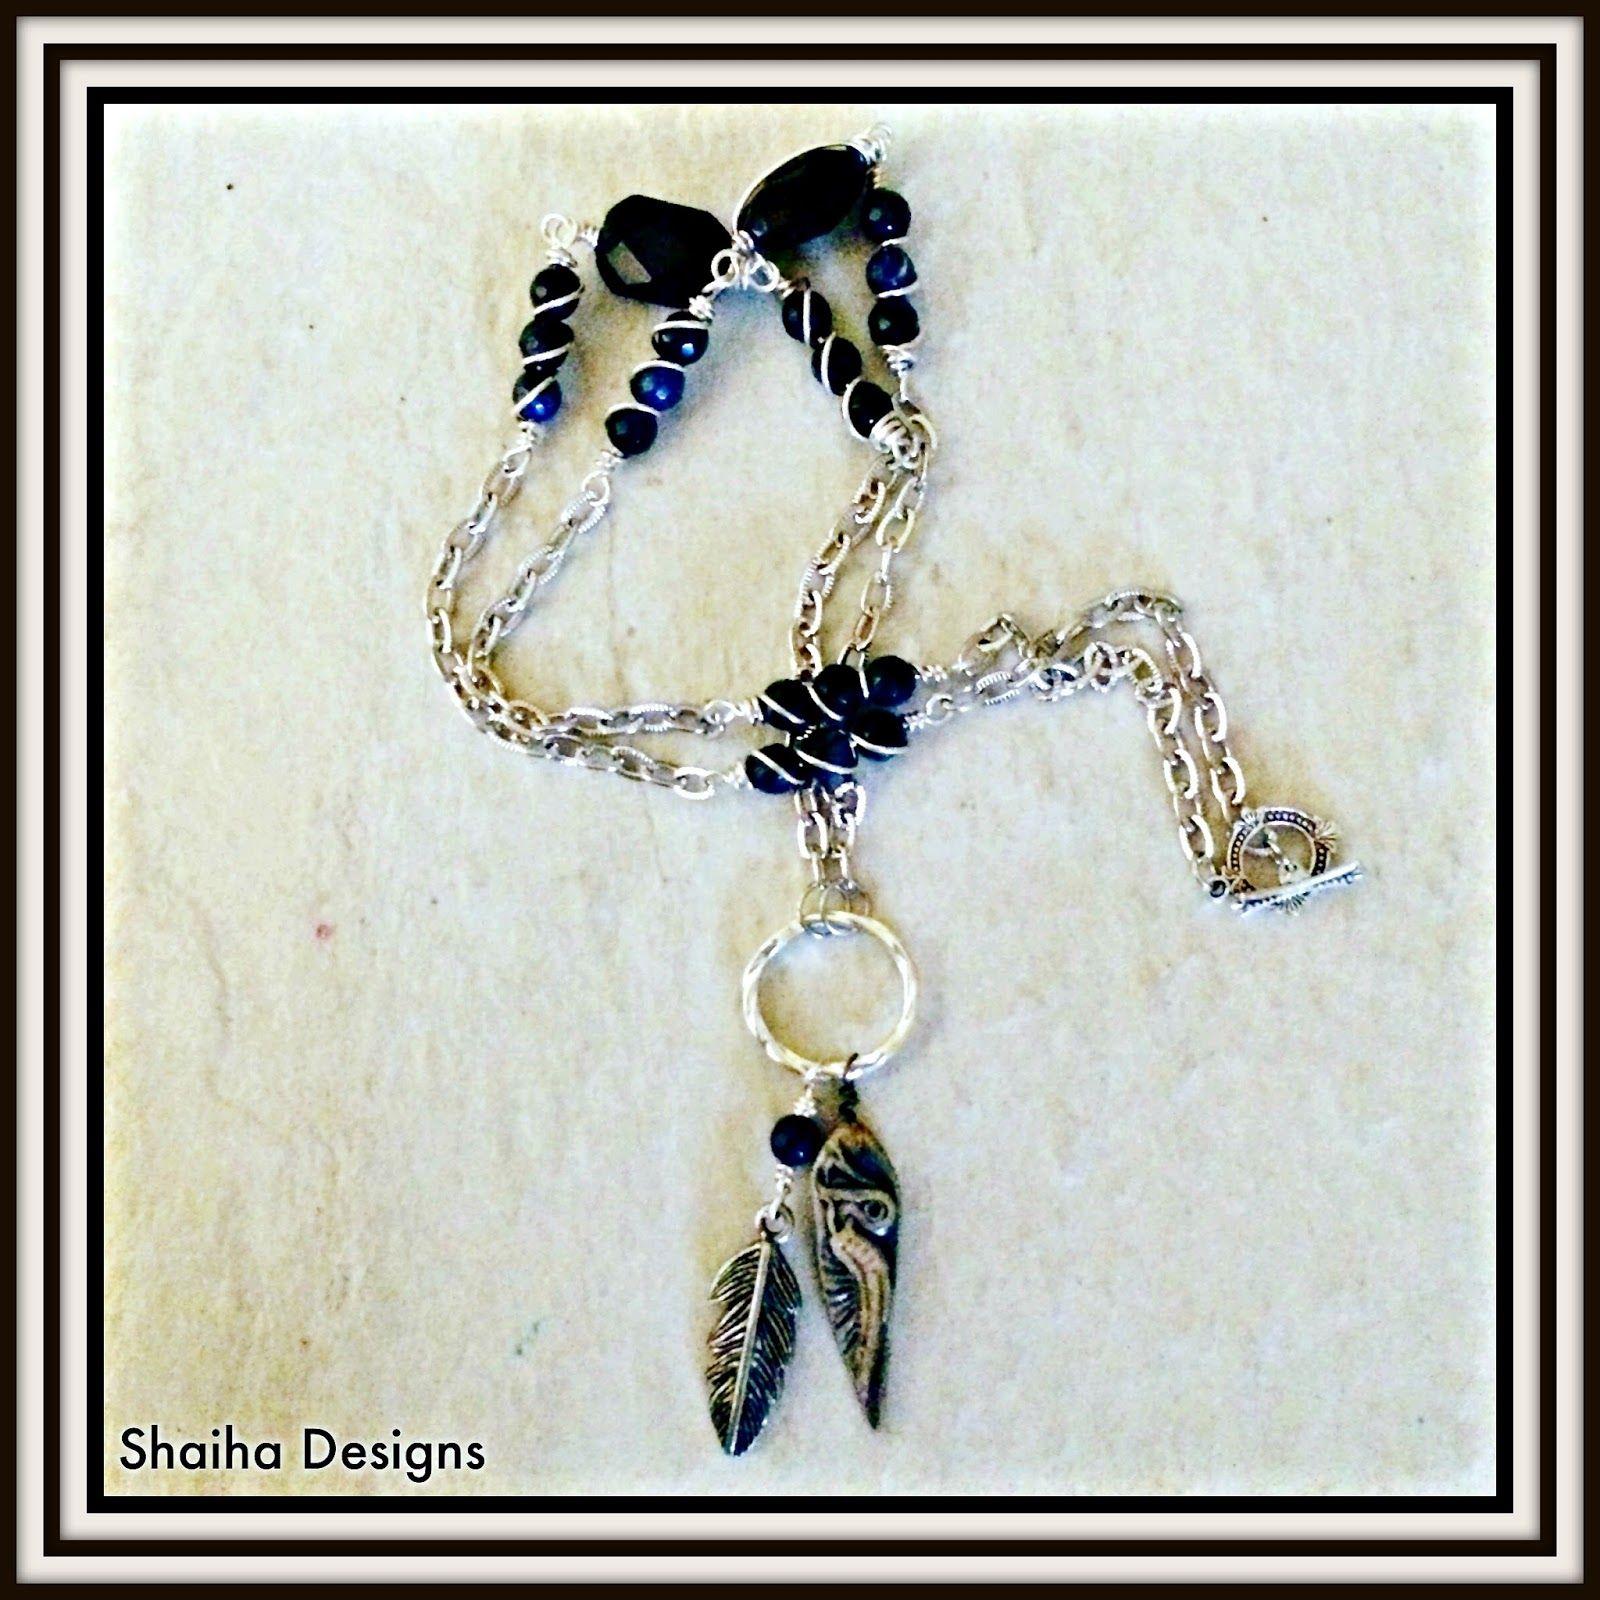 Shaiha's Ramblings: Art Jewelry Elements Head Pin Blog Hop